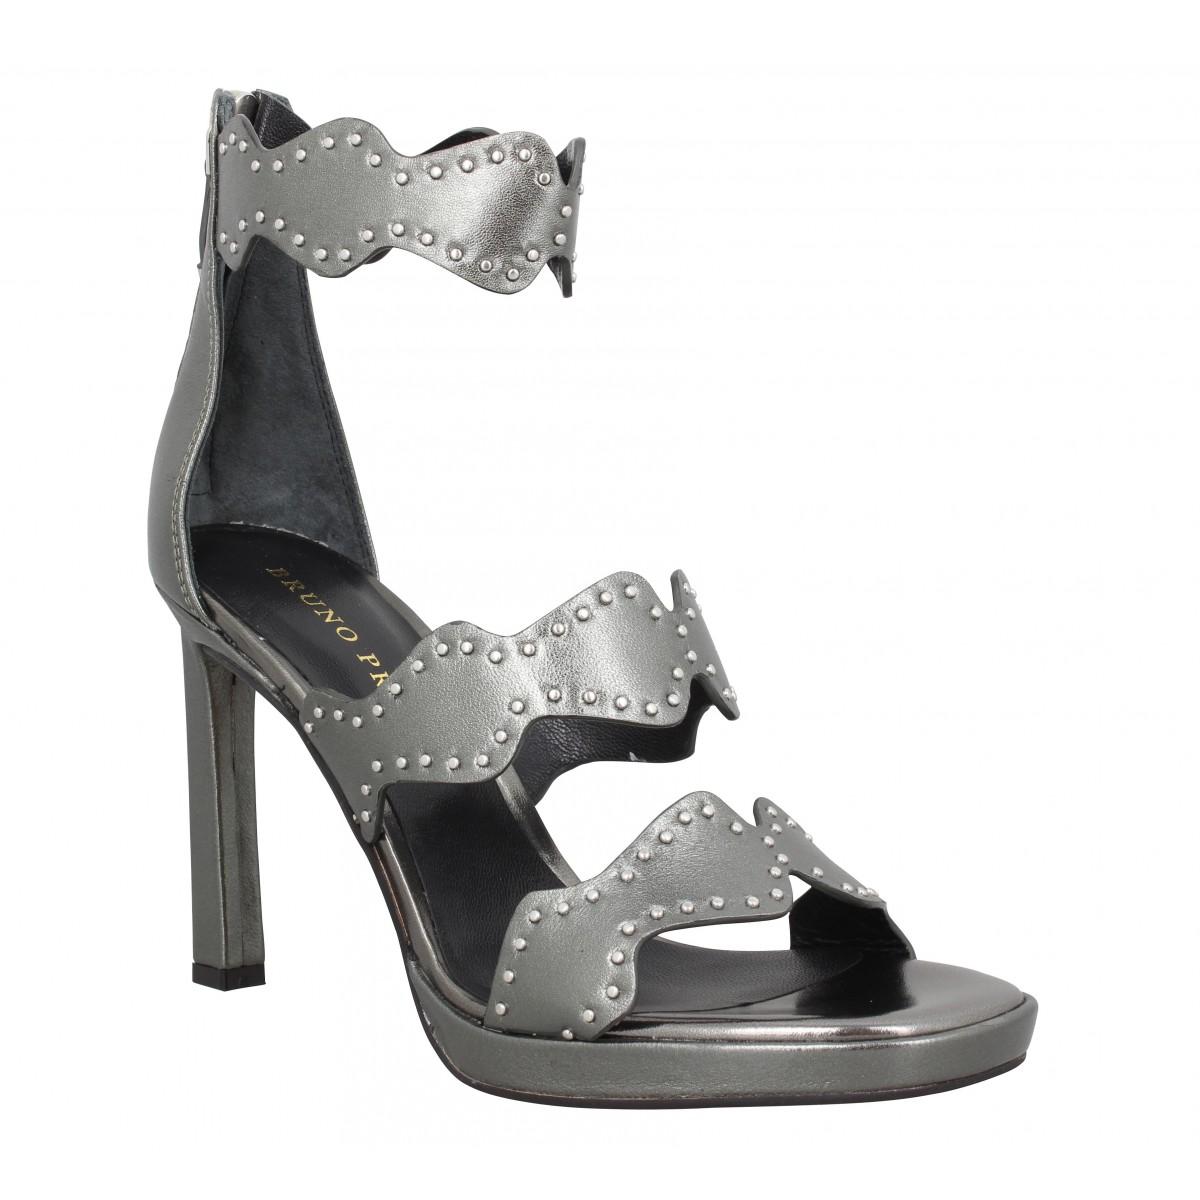 Sandales talons BRUNO PREMI 350 cuir Femme Anthracite